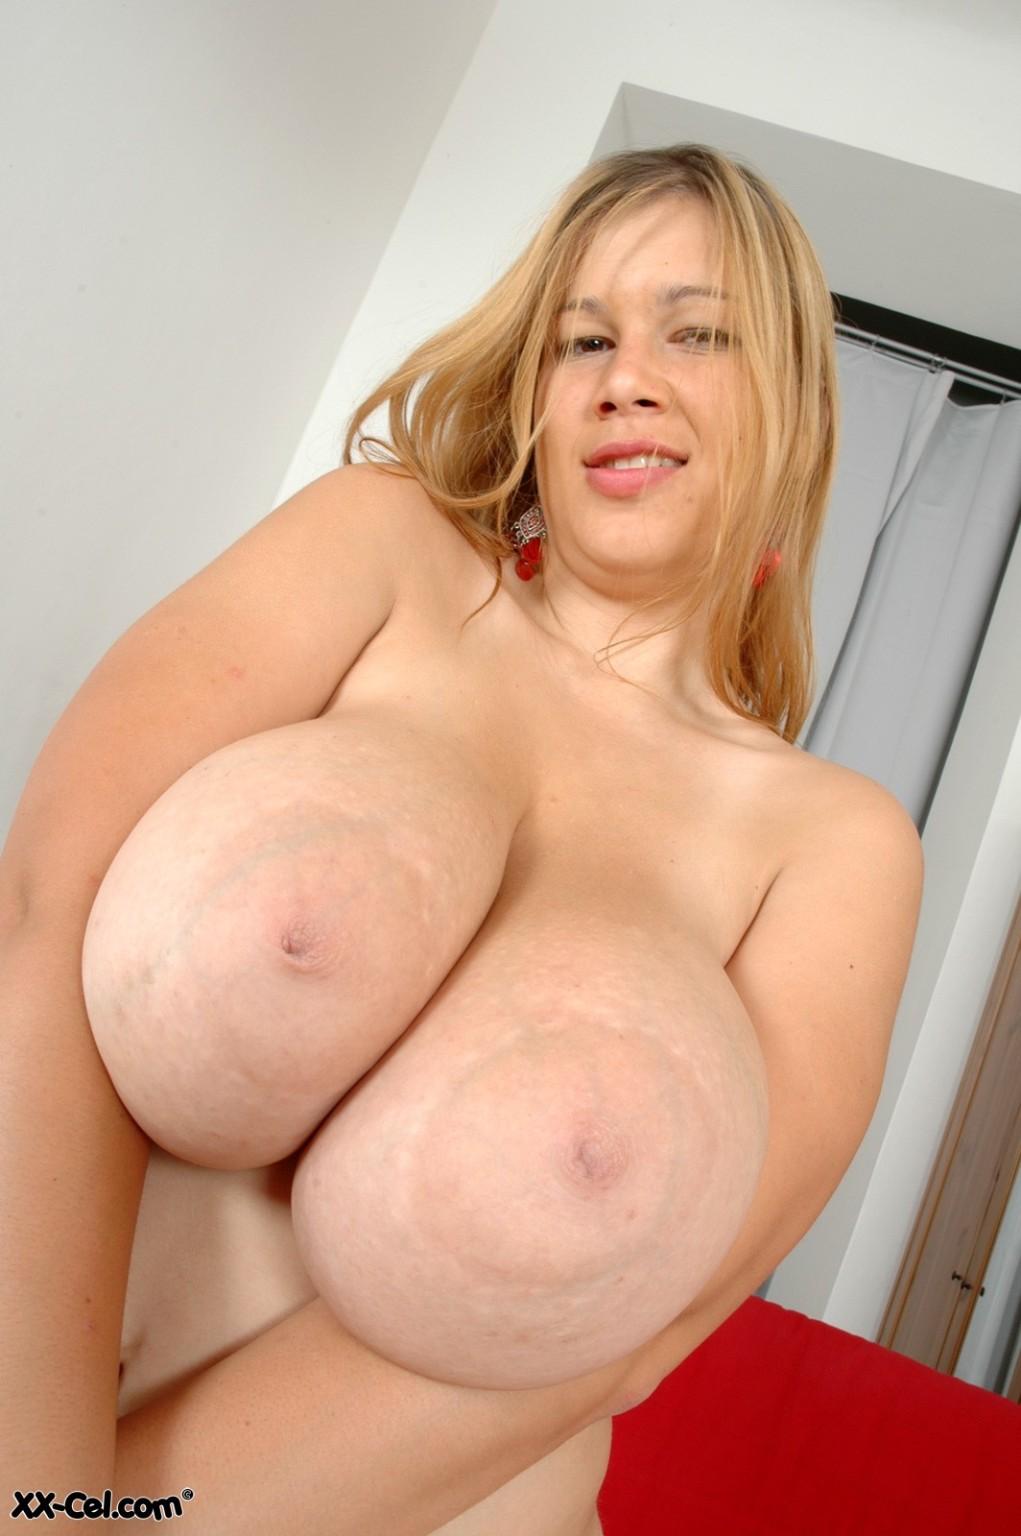 Big tits ex gf selfie